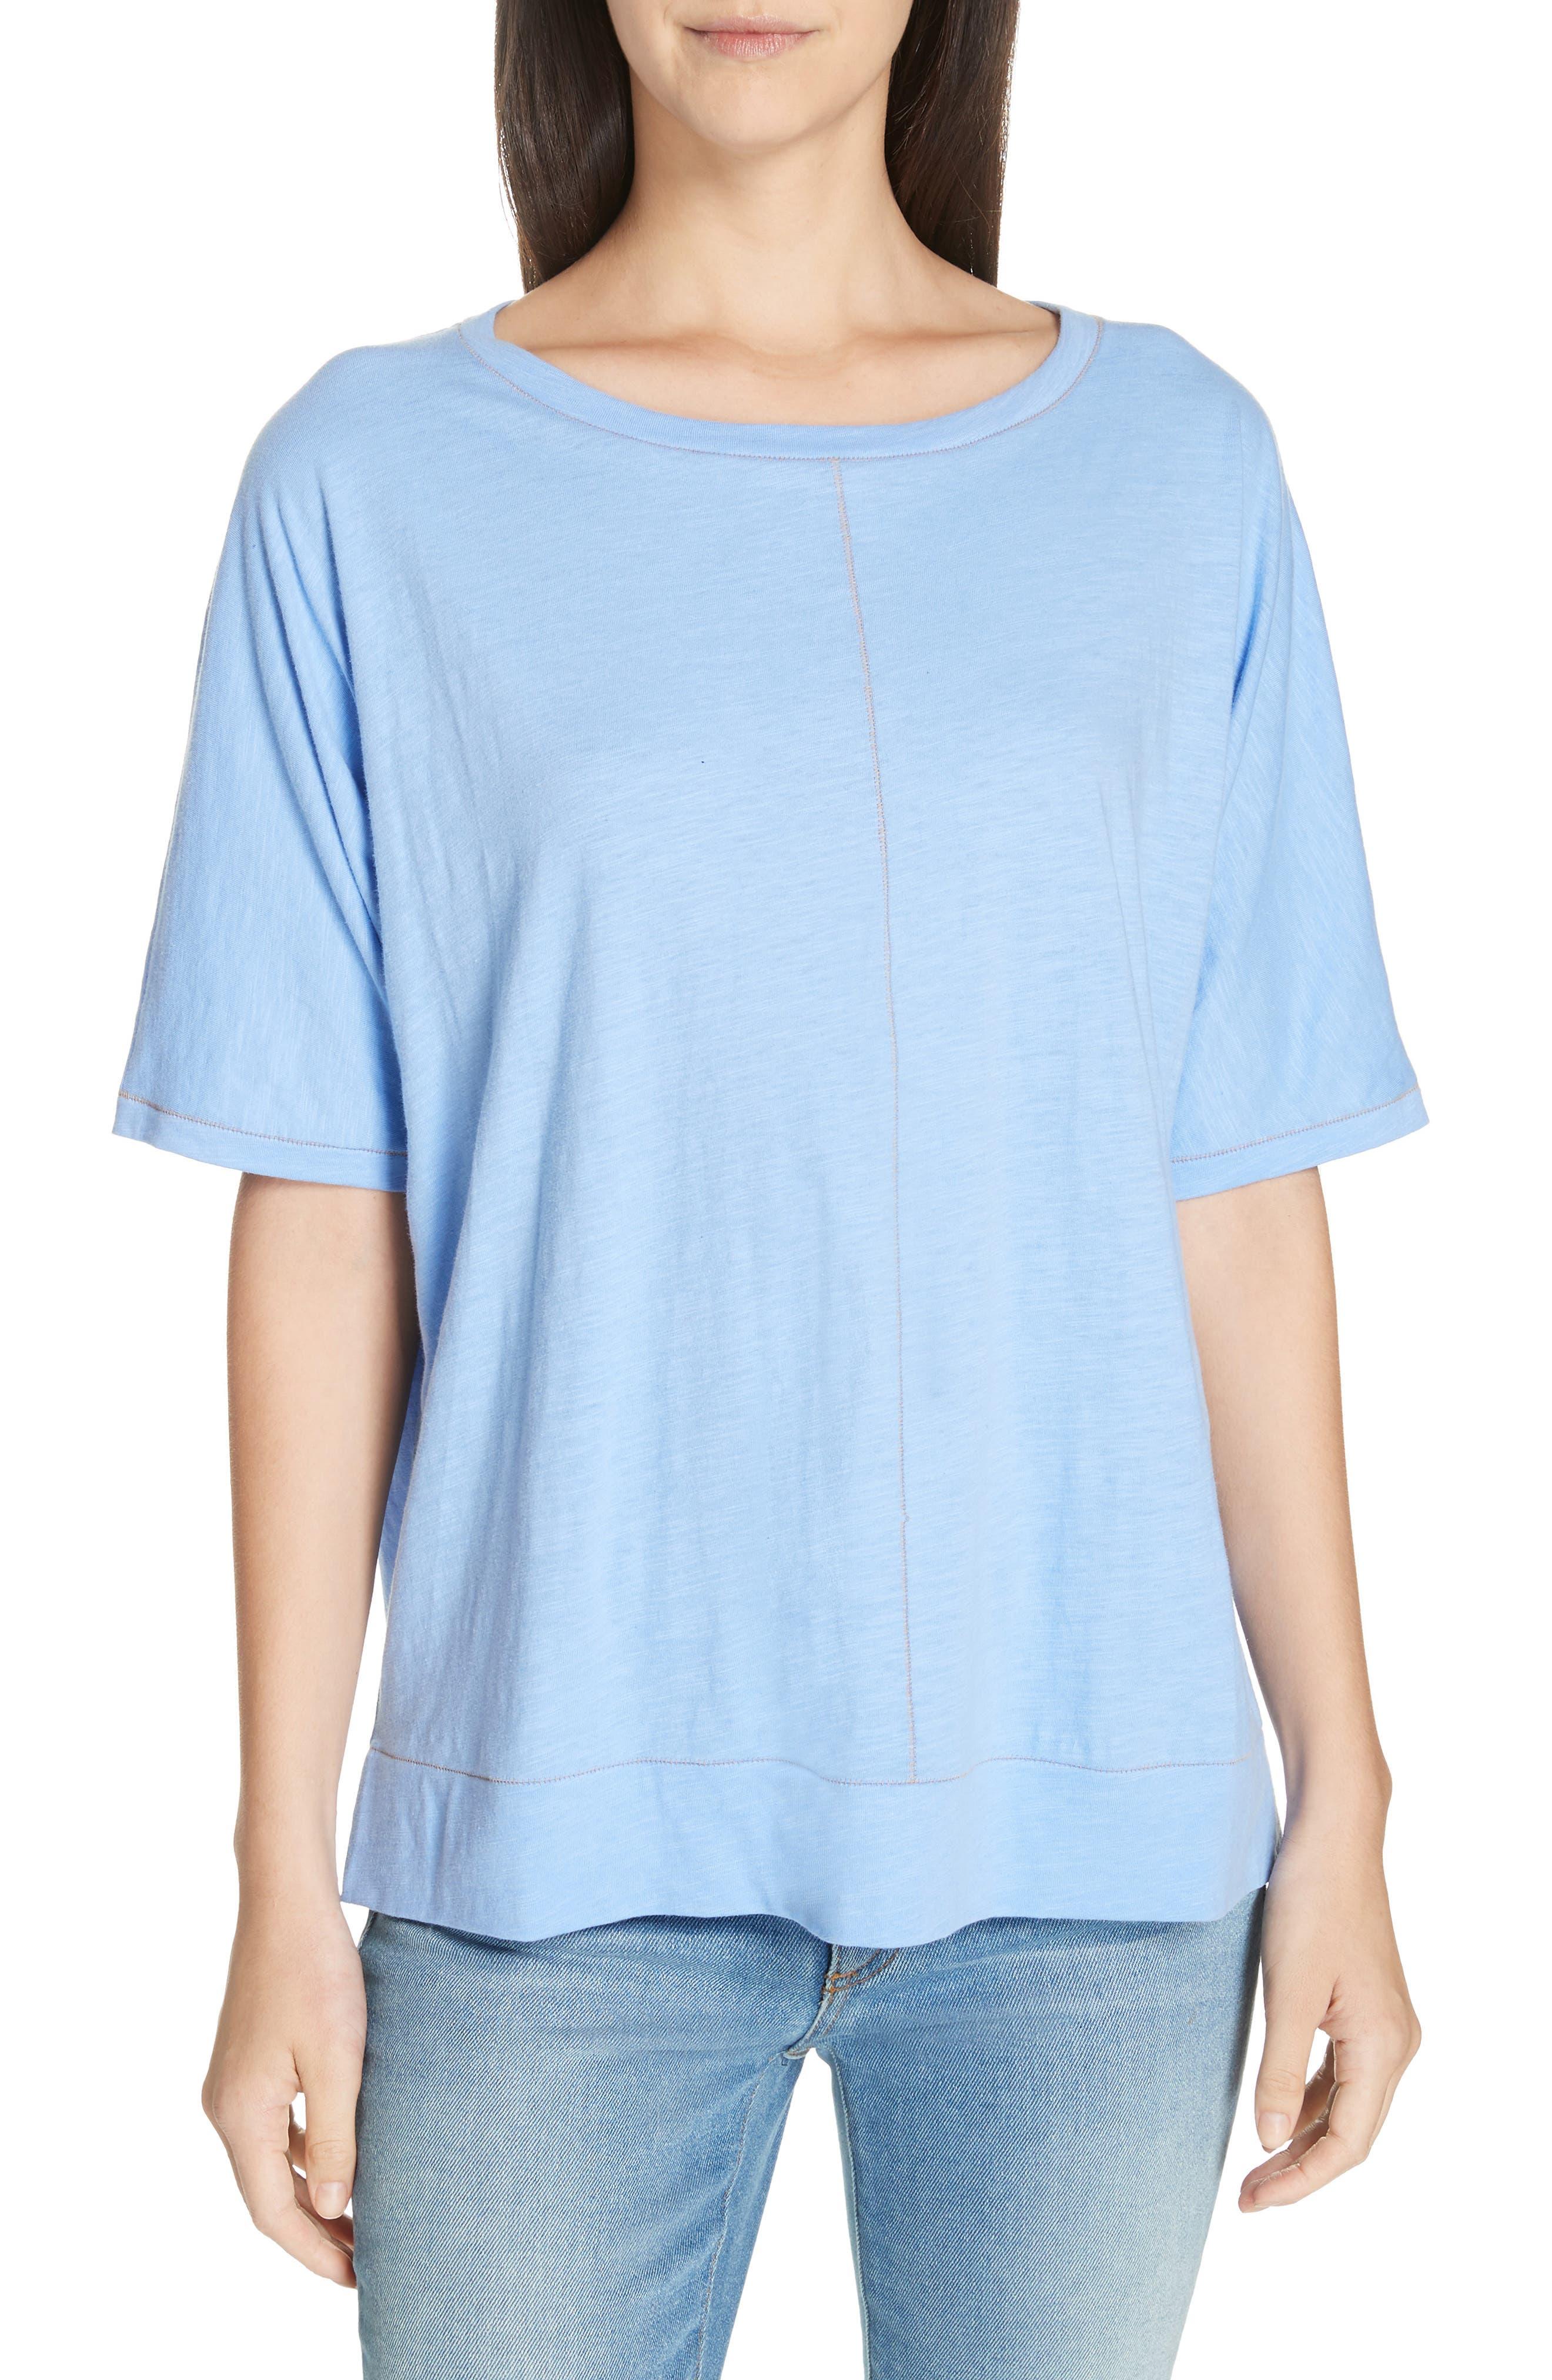 Eileen Fisher Jewel Neck Organic Cotton Tee, Blue